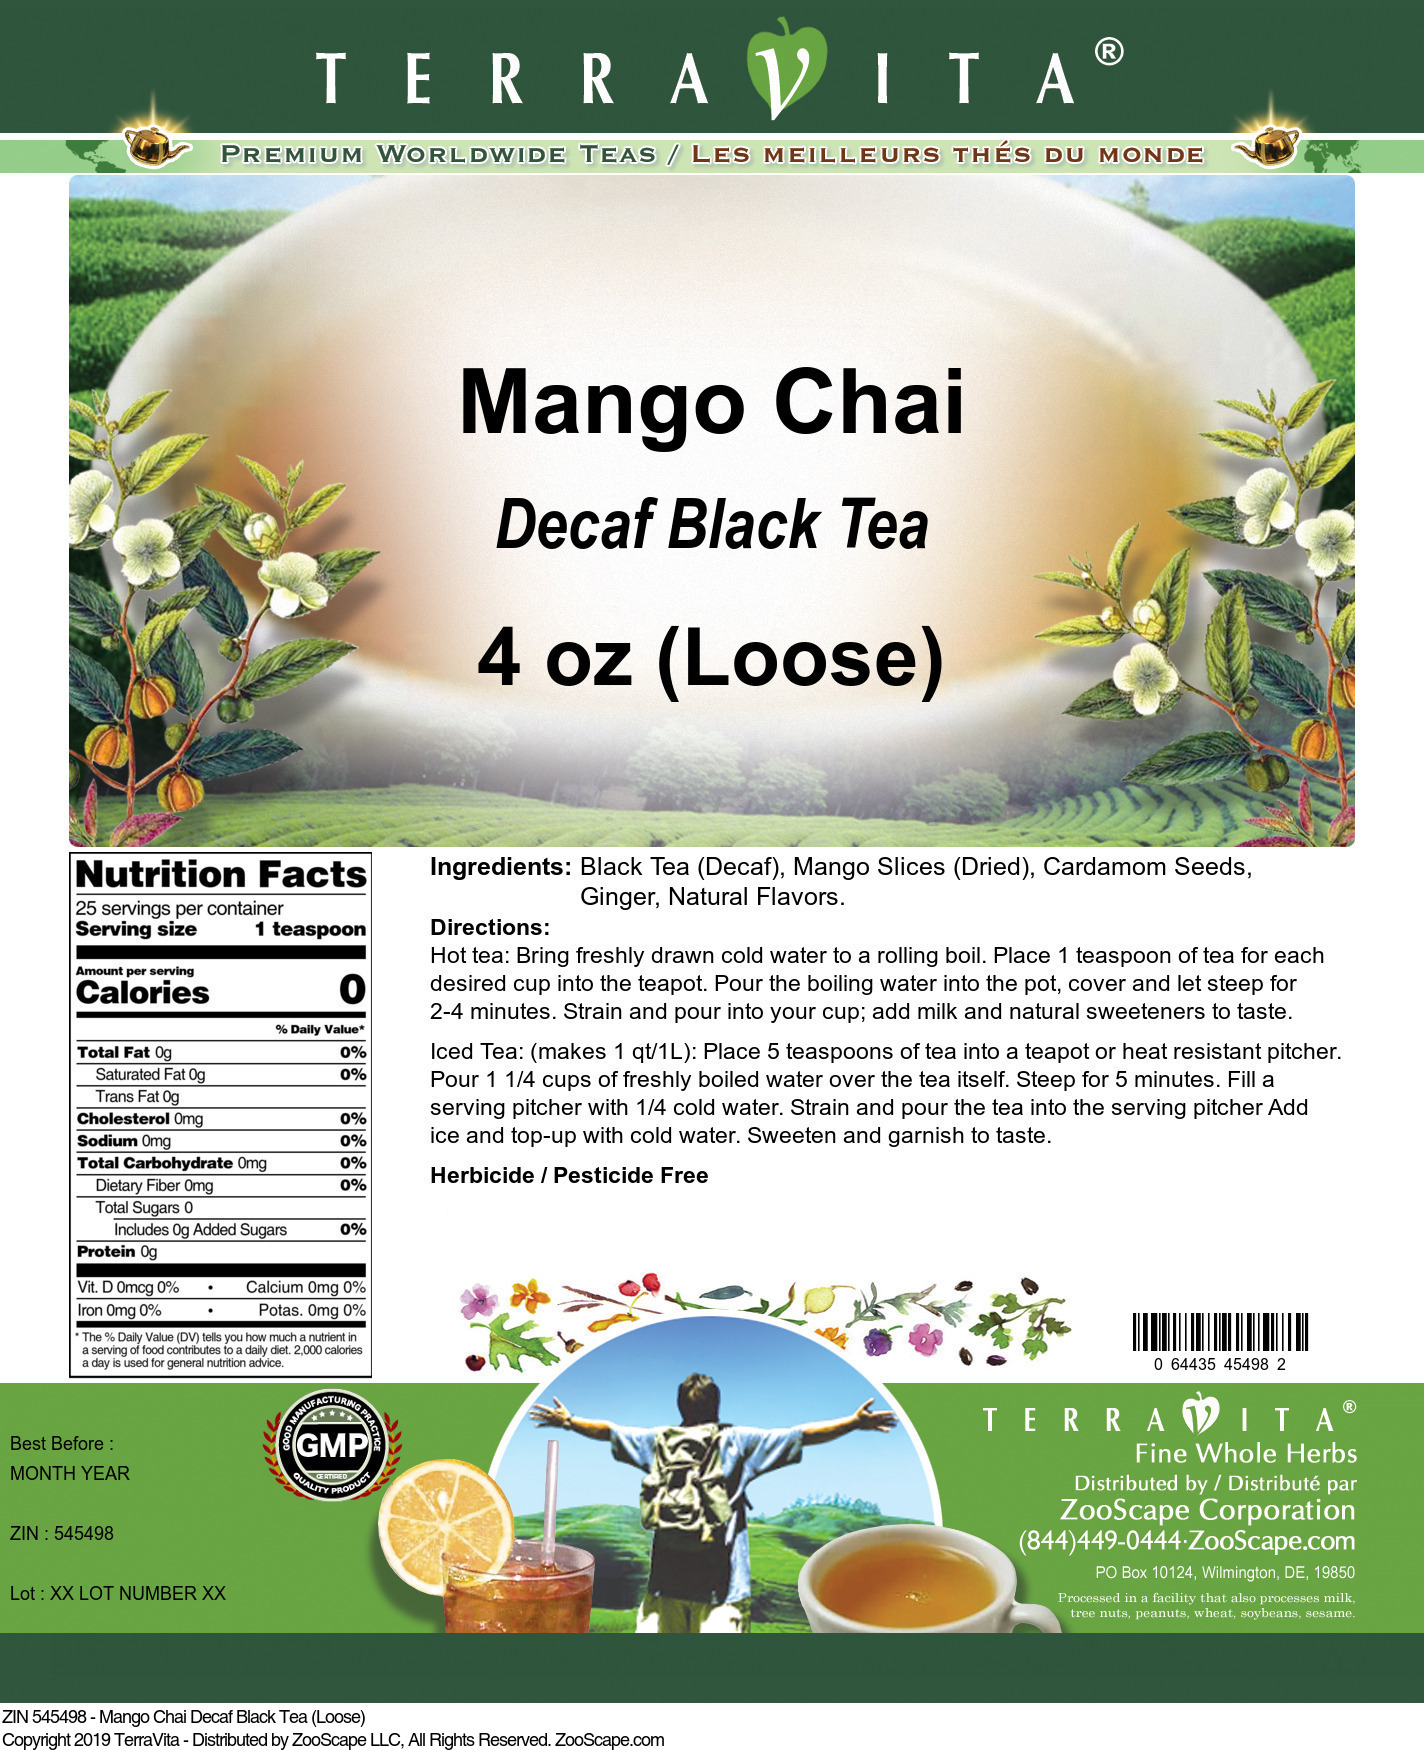 Mango Chai Decaf Black Tea